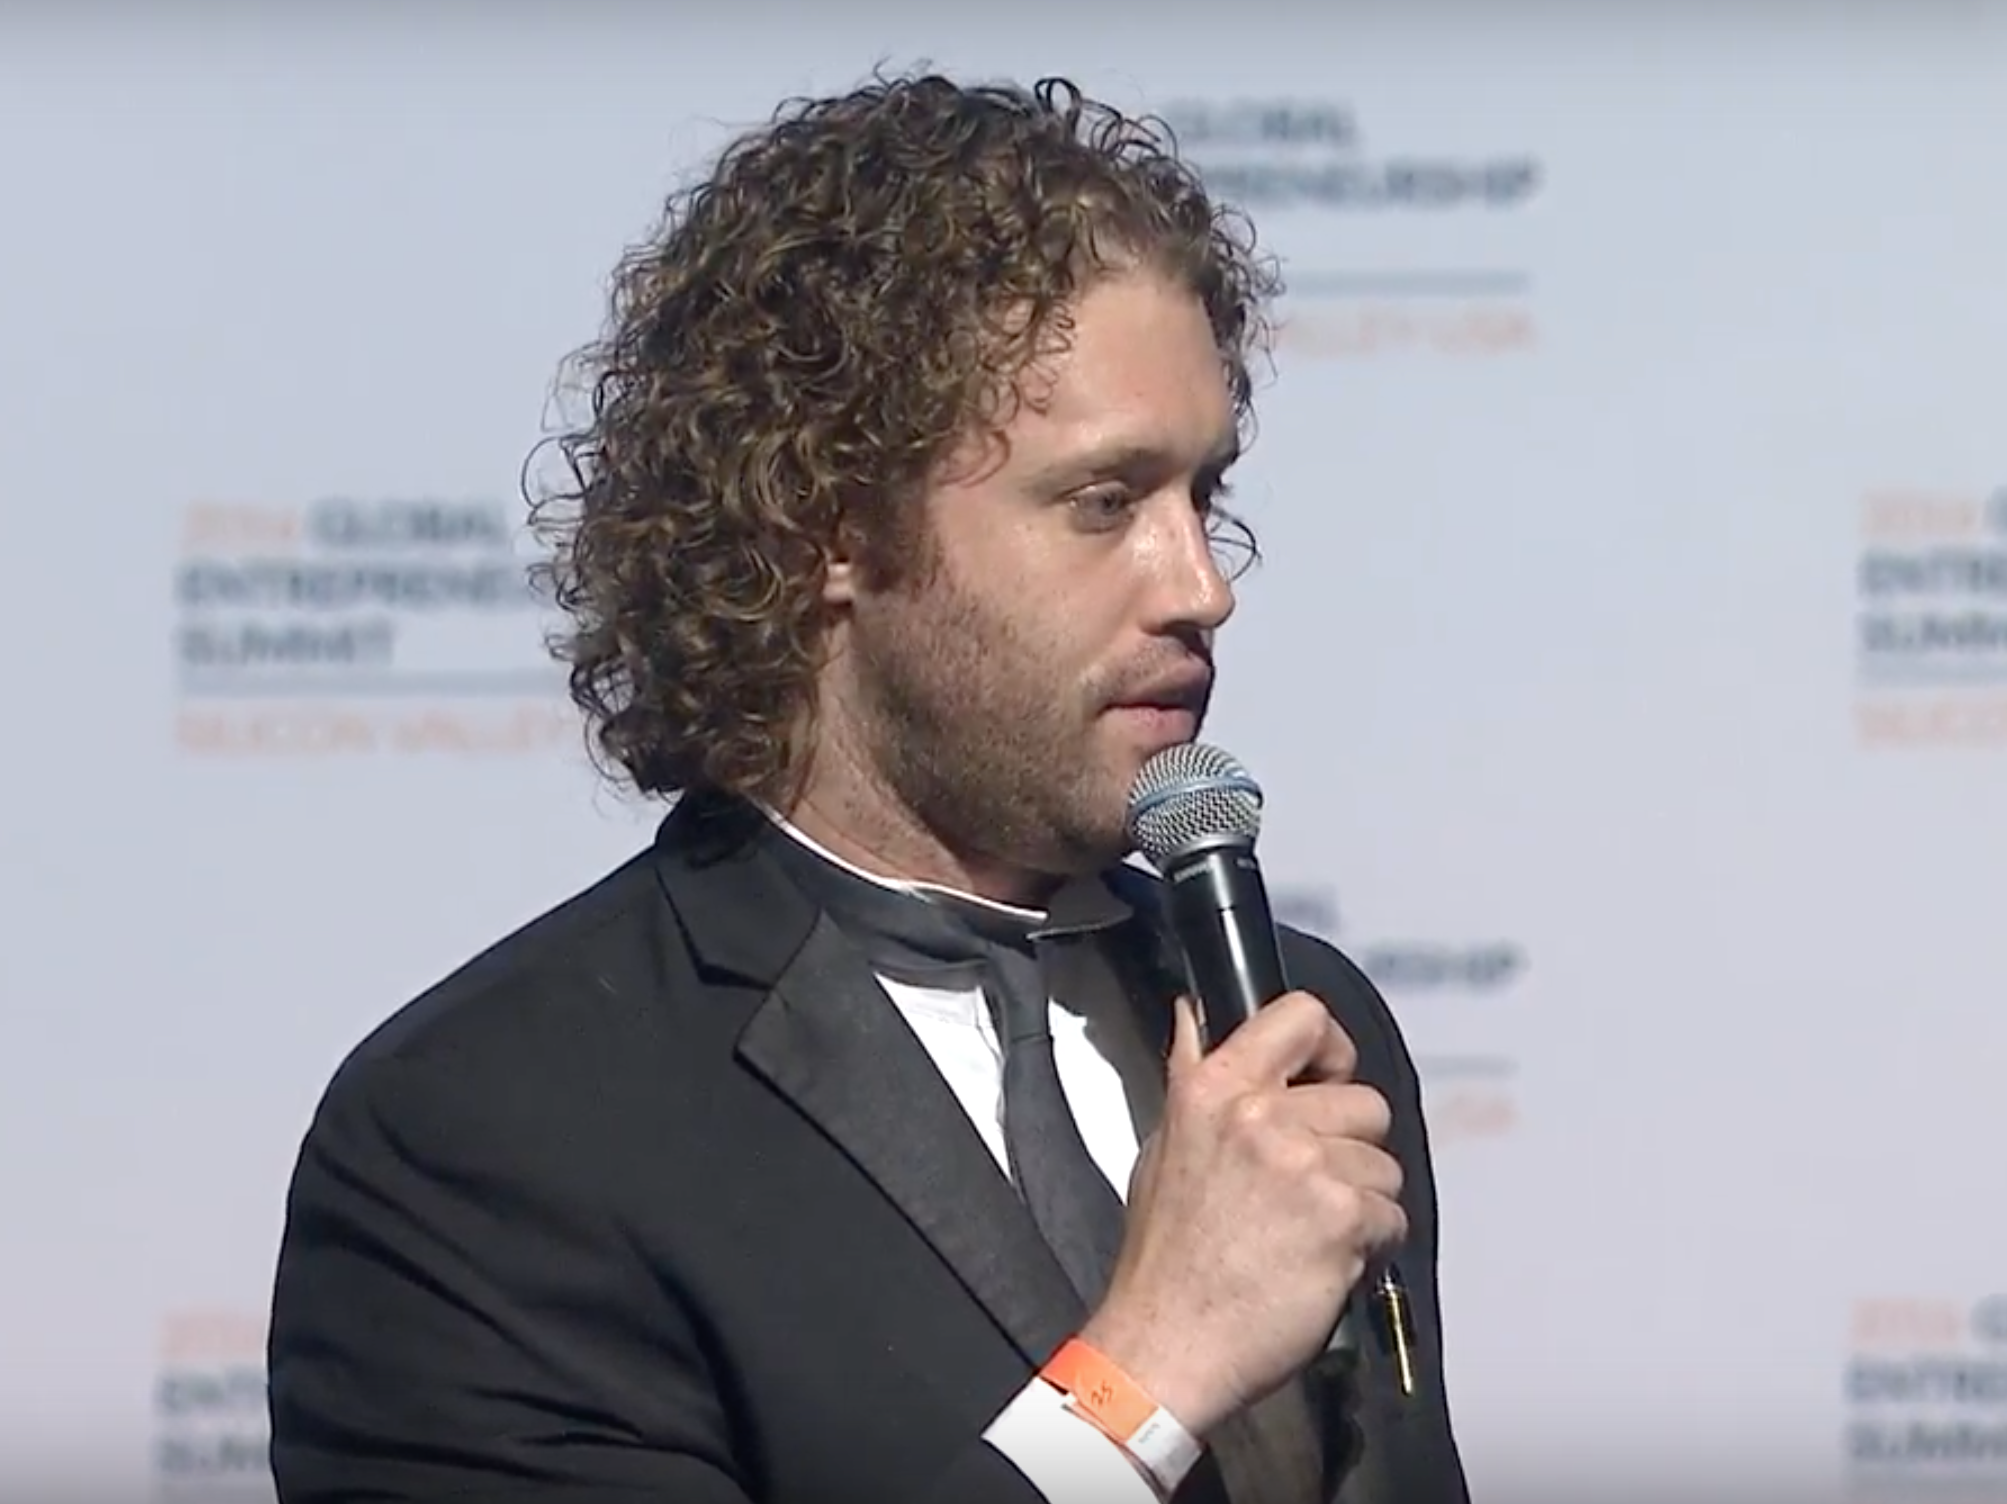 The Cast of 'Silicon Valley' Crashes Global Entrepreneurship Summit